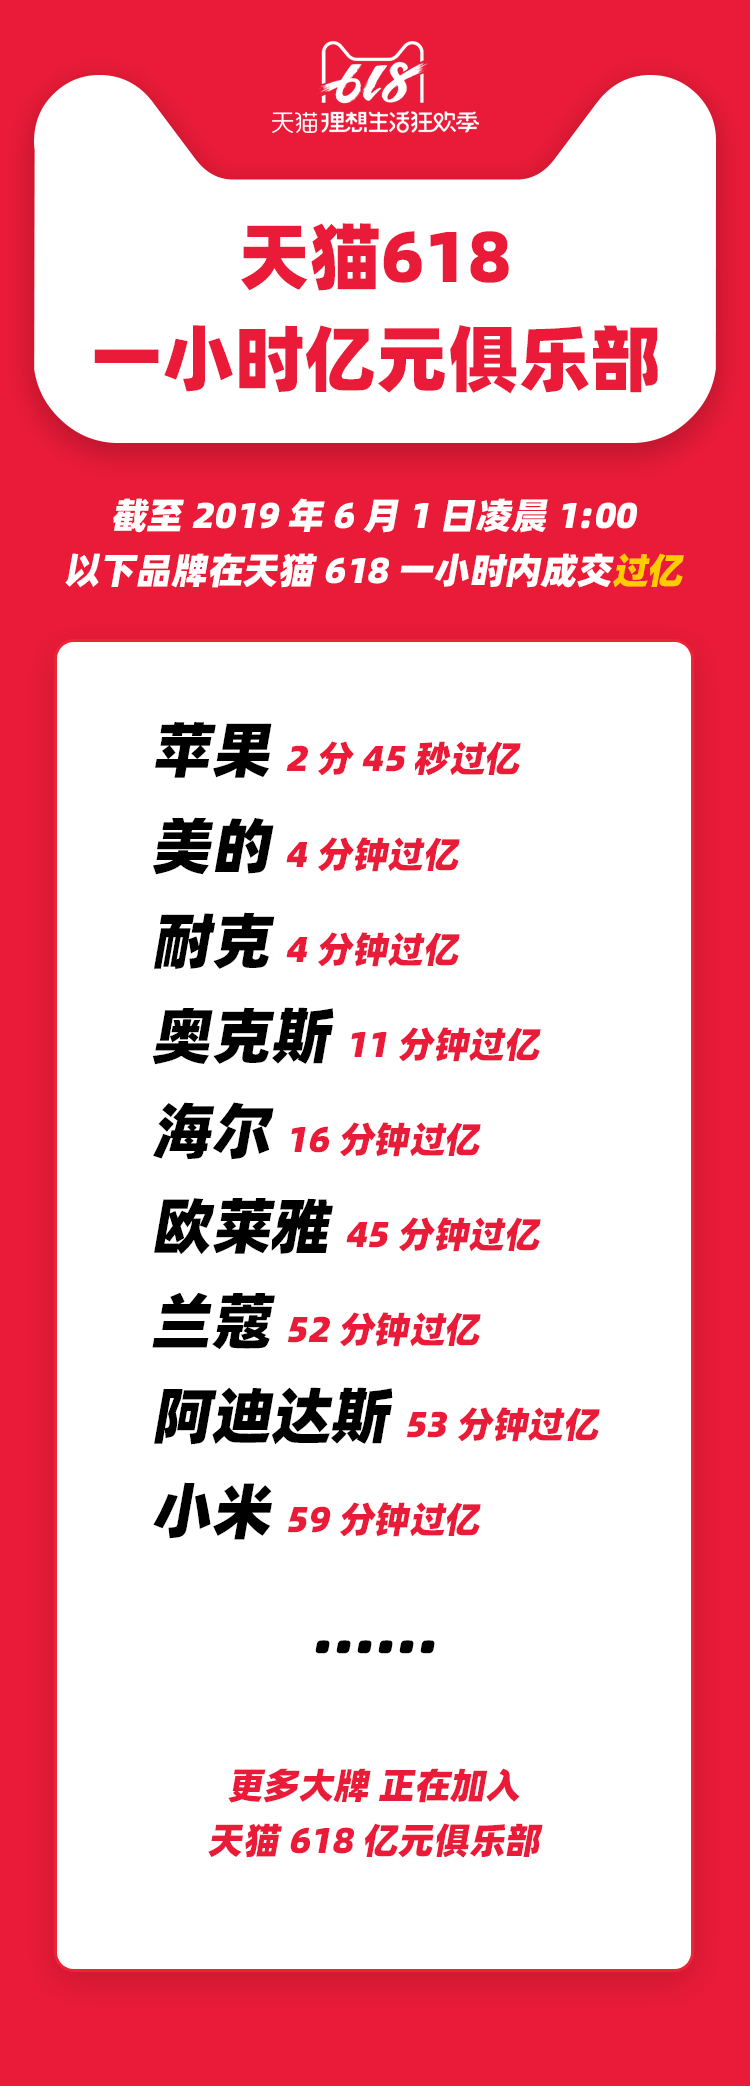 Taobao Brief Report